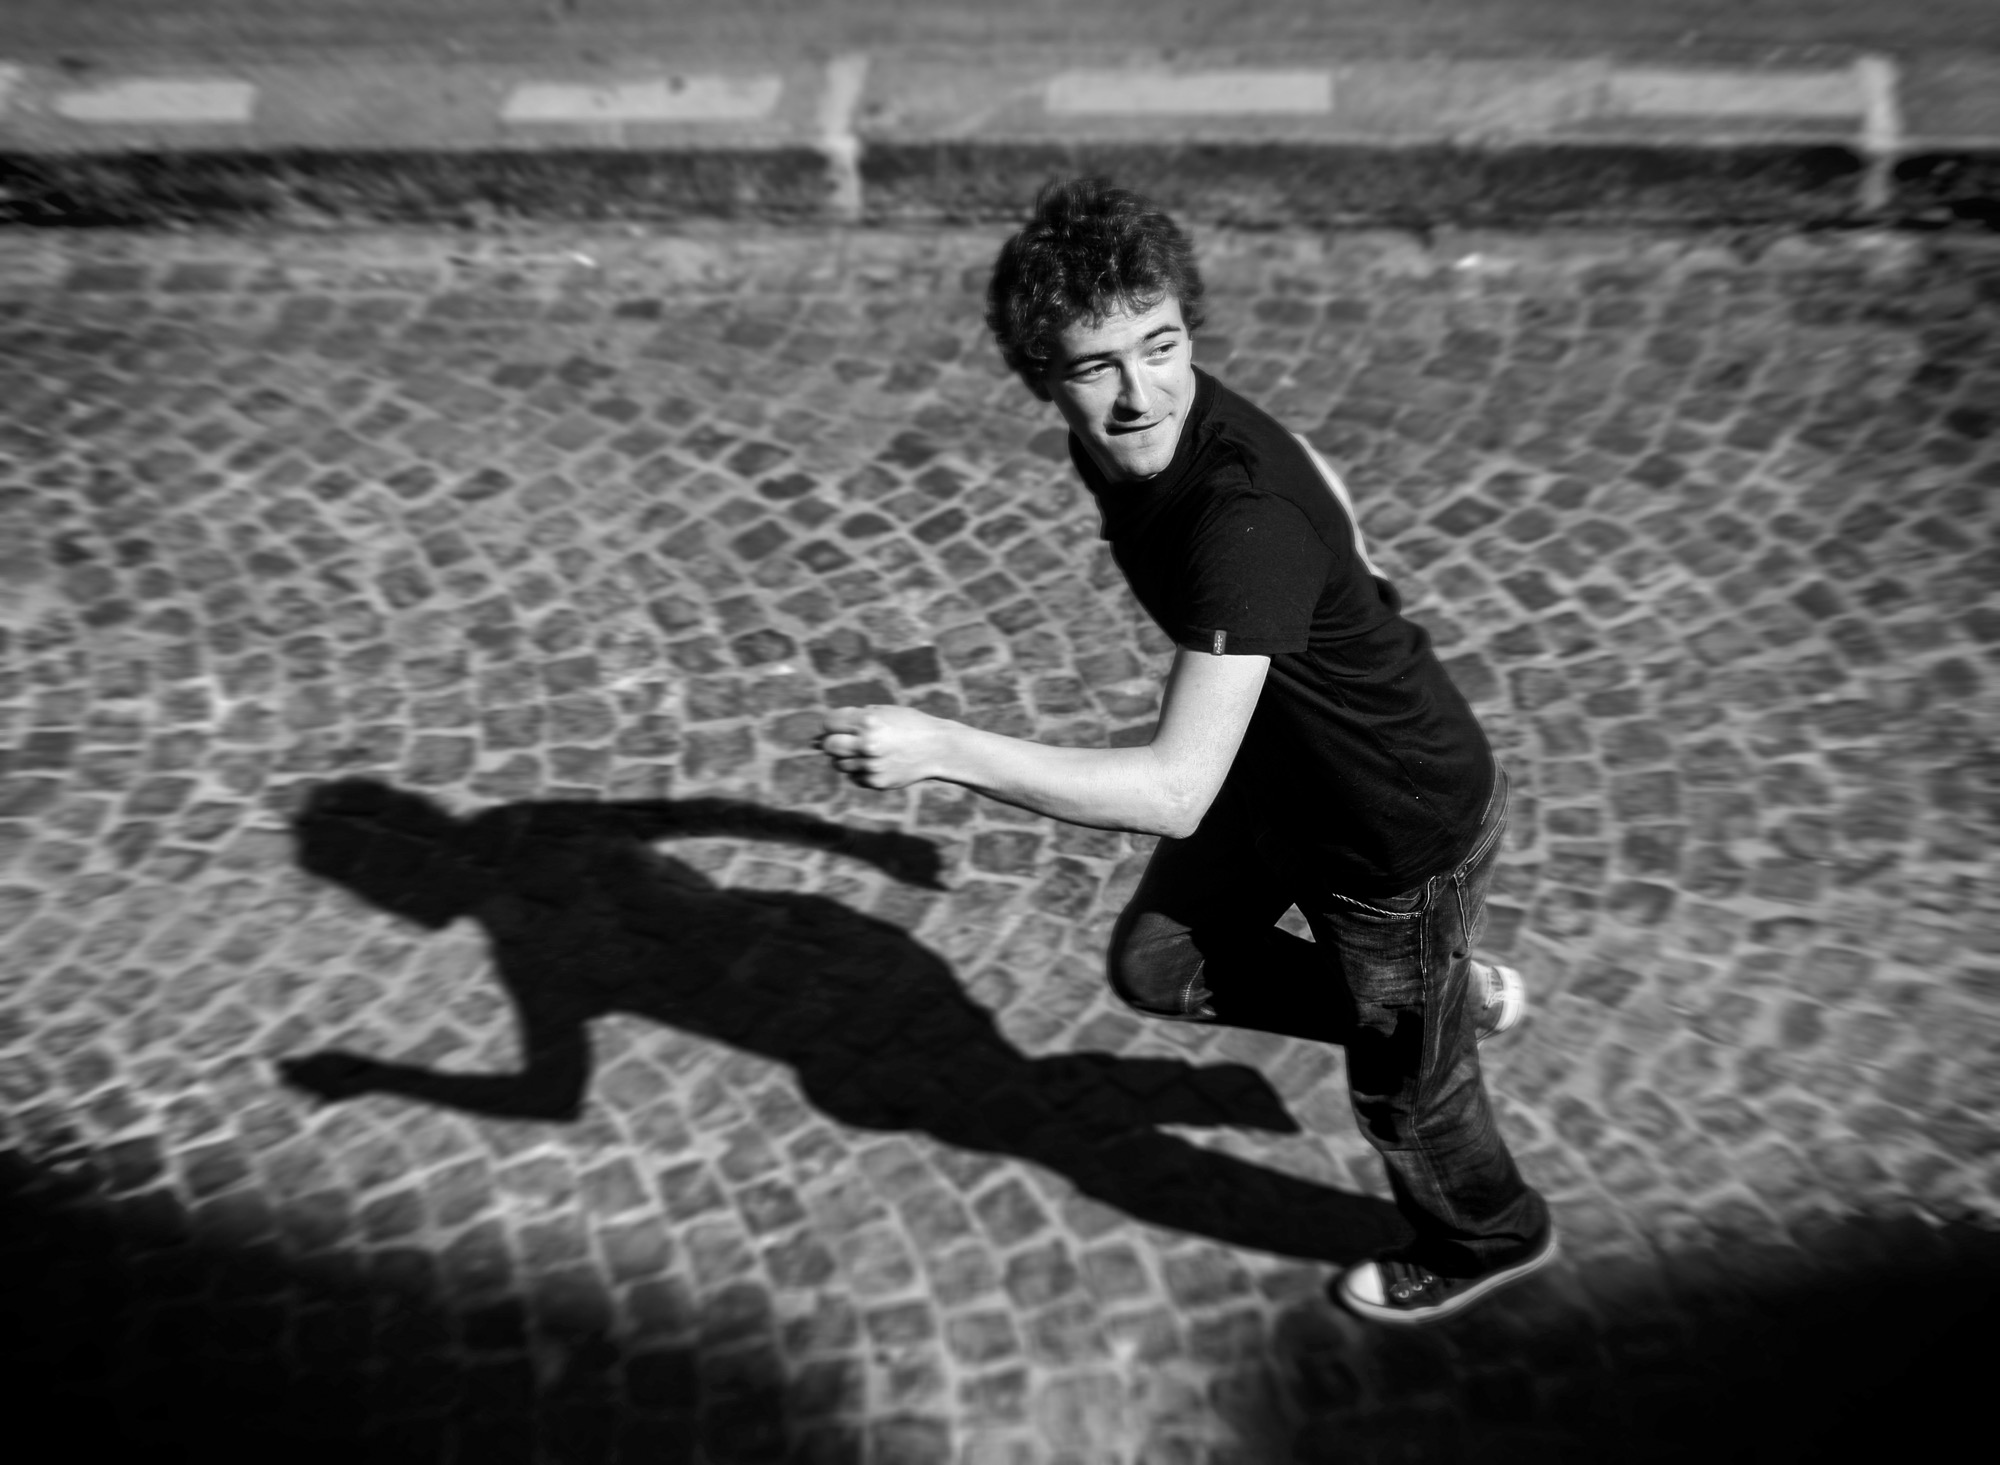 Renan Luce © Emmanuel Pain